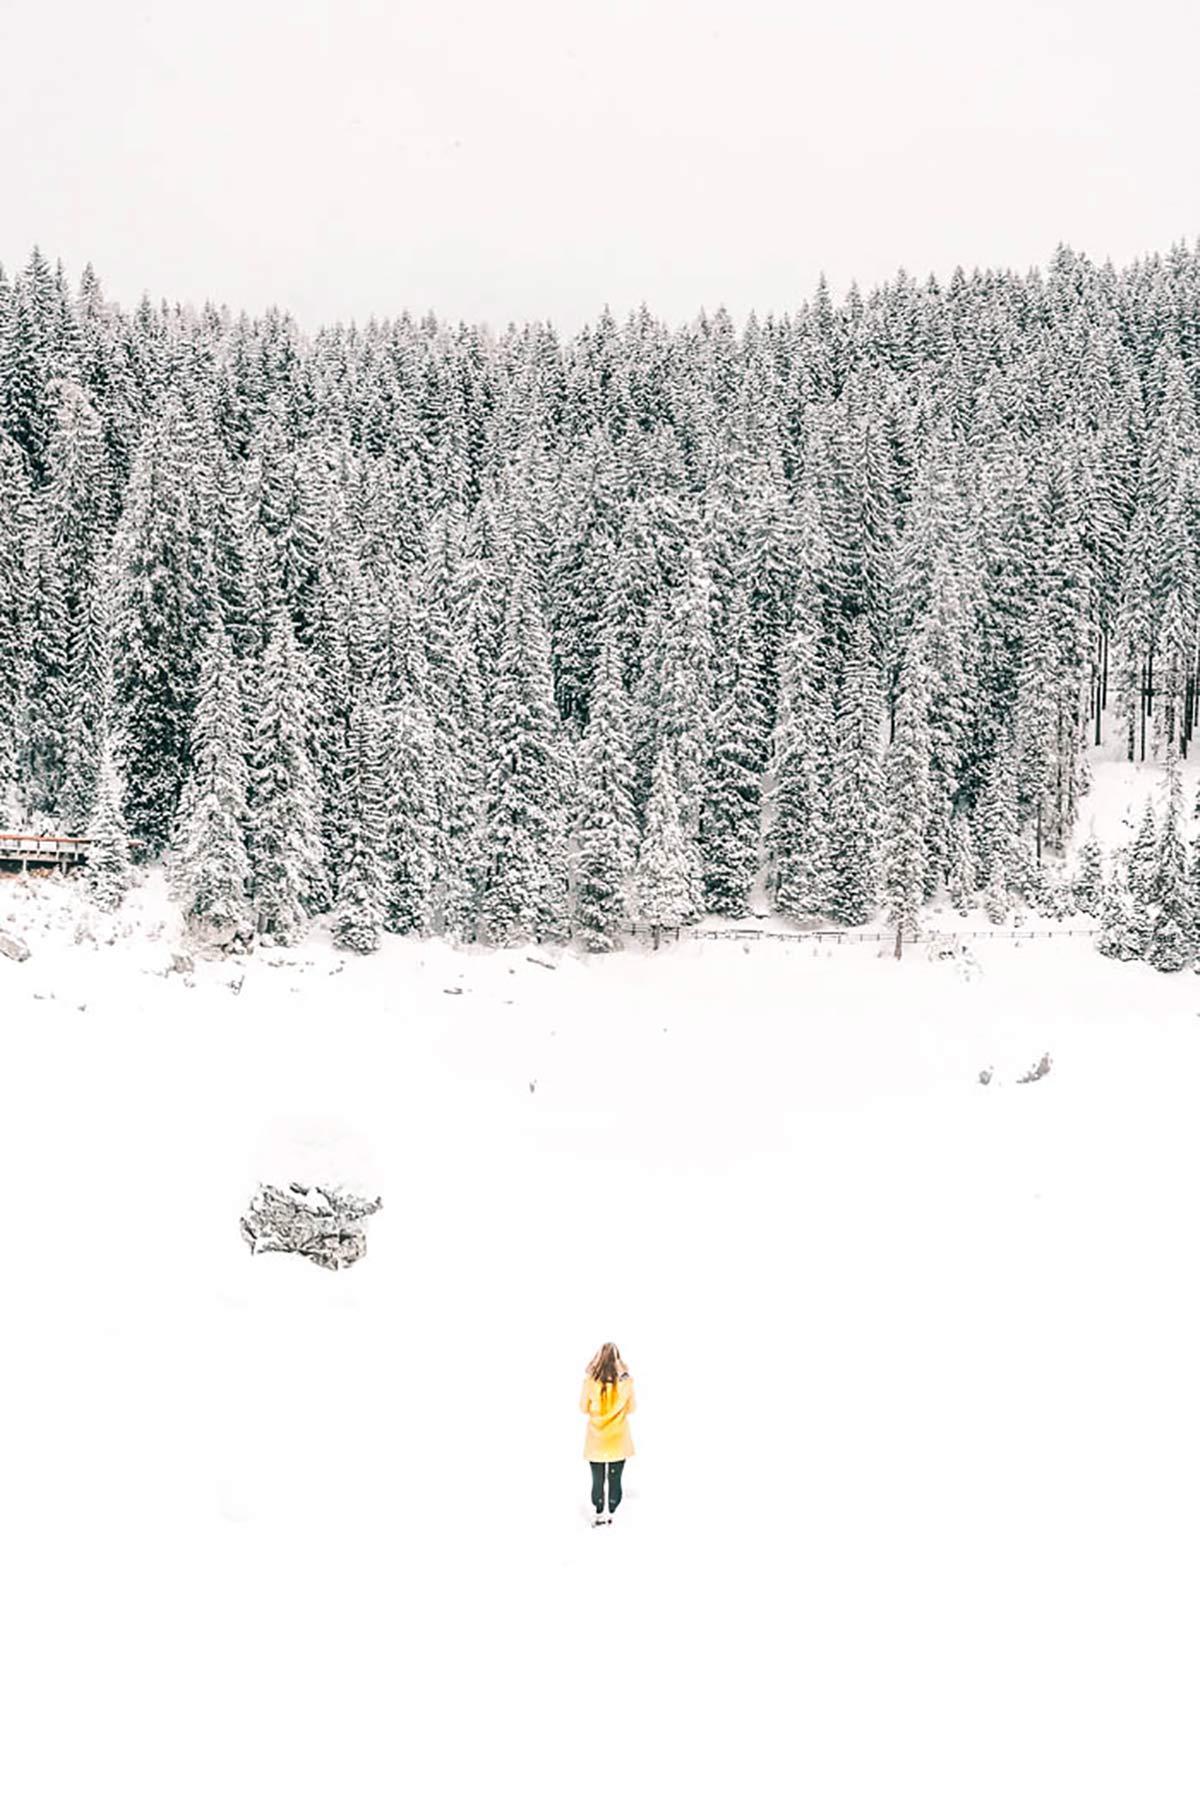 Karersee Winter